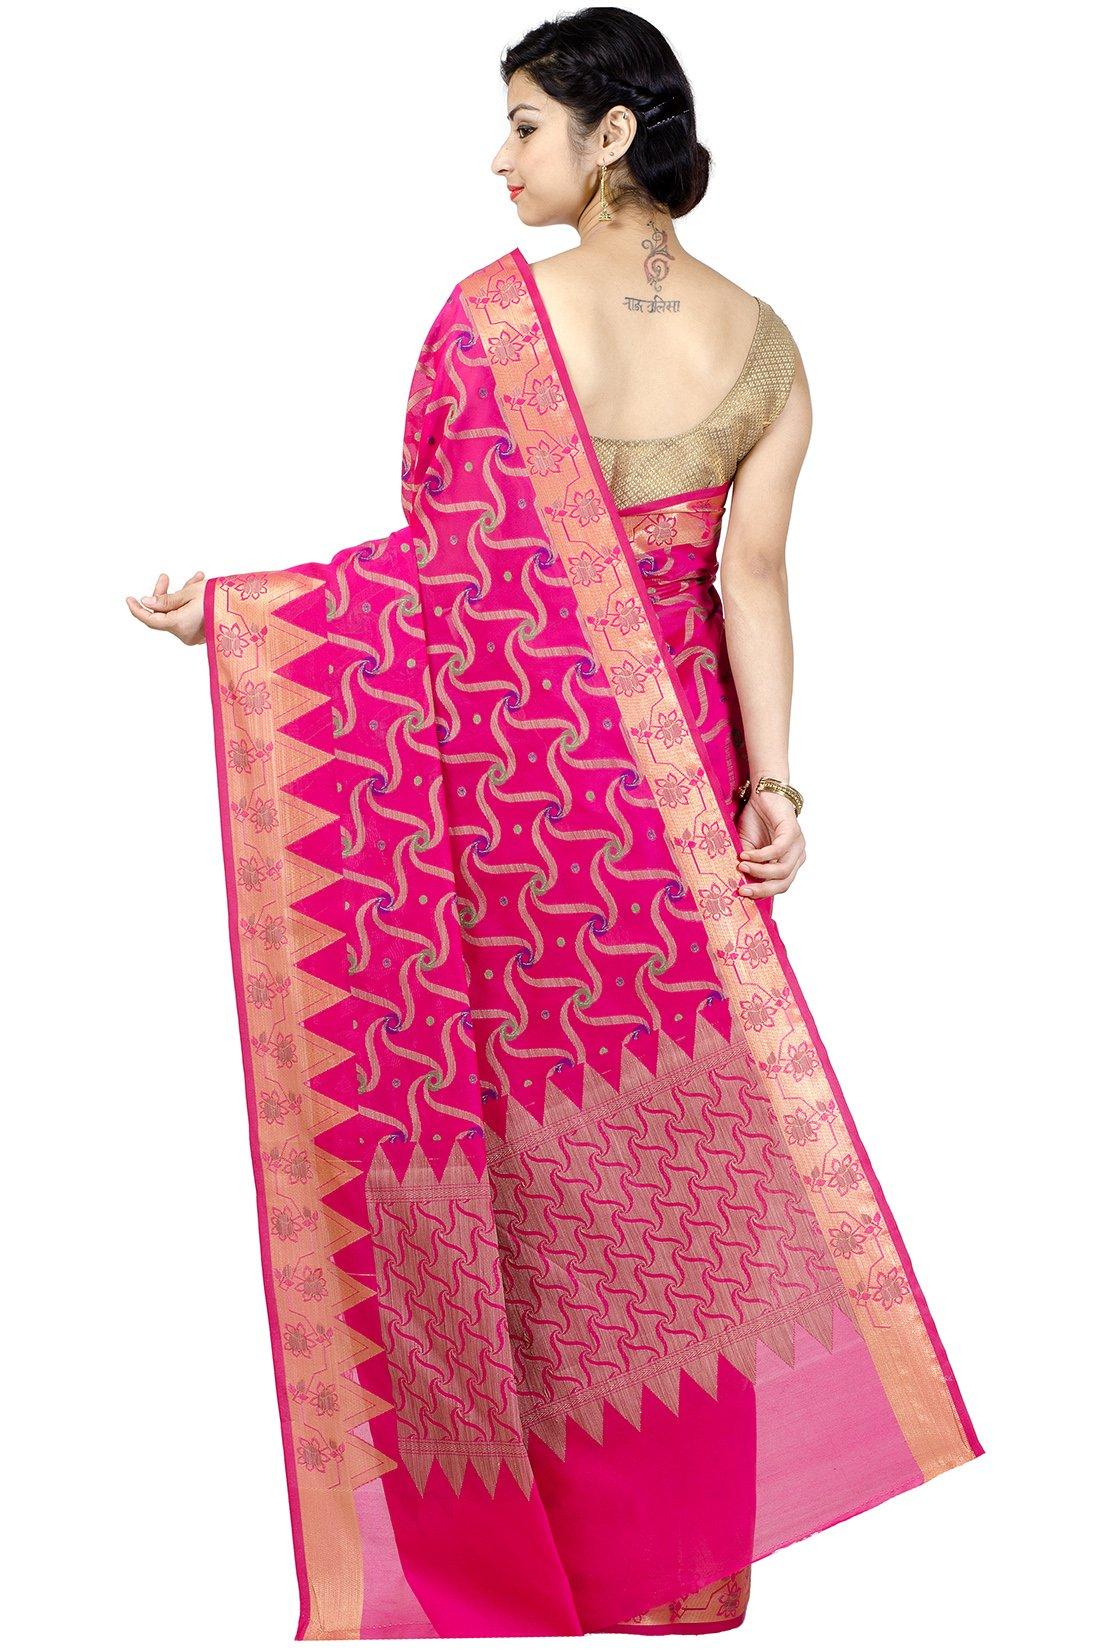 Chandrakala Women's Rani Banarasi Cotton Silk Saree by Chandrakala (Image #2)